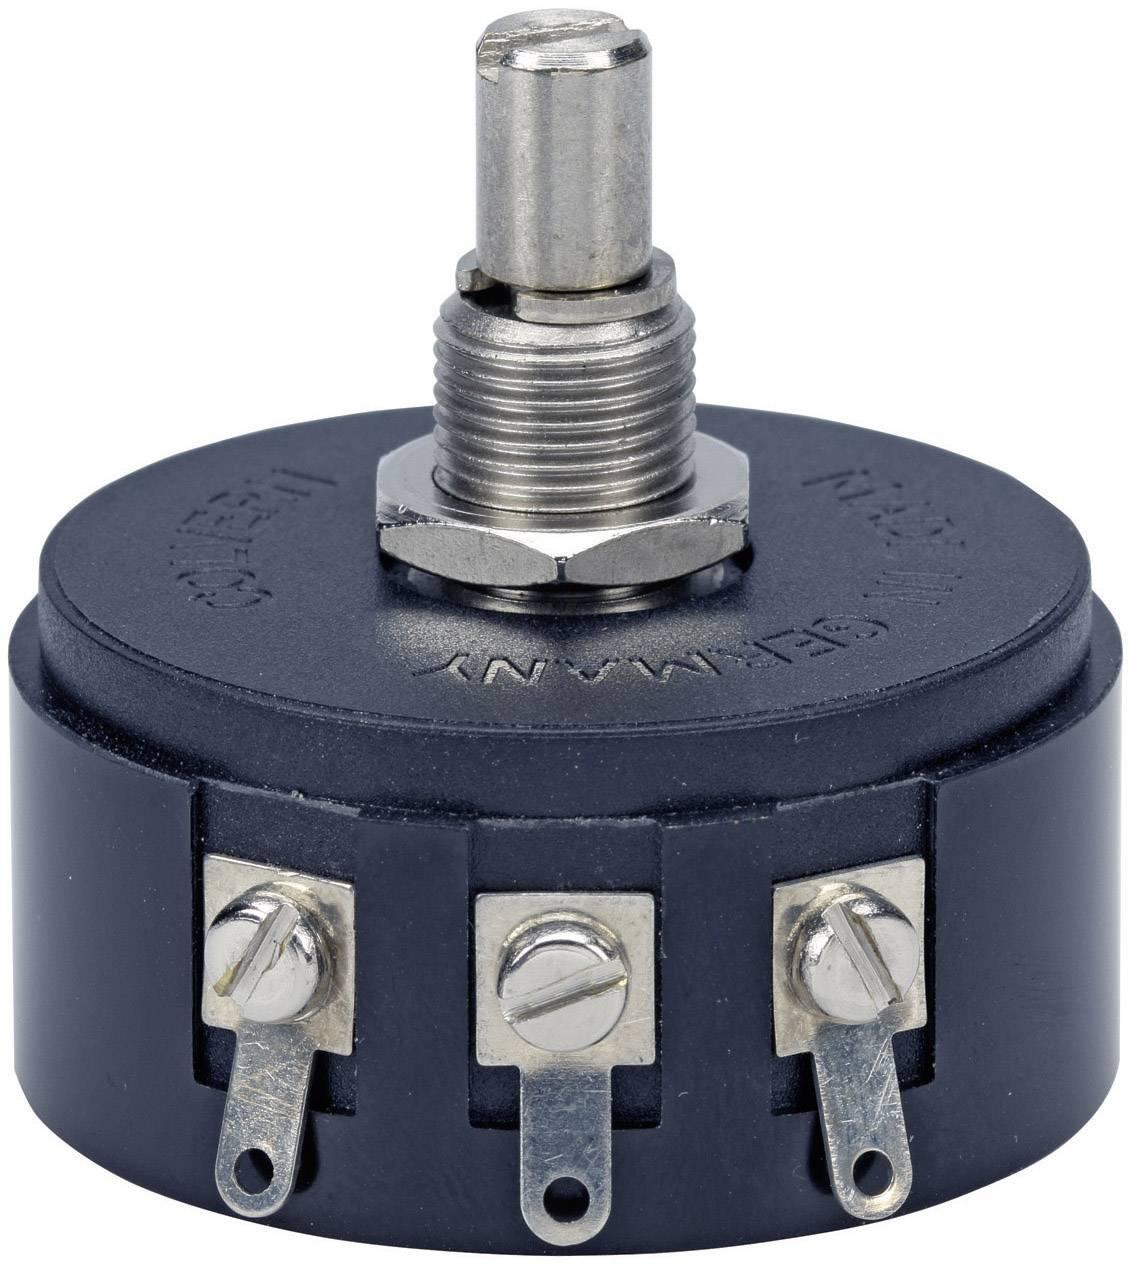 Drôtový potenciometer mono TT Electronics AB 3104001140 3104001140, 3 W, 1 kOhm, 1 ks